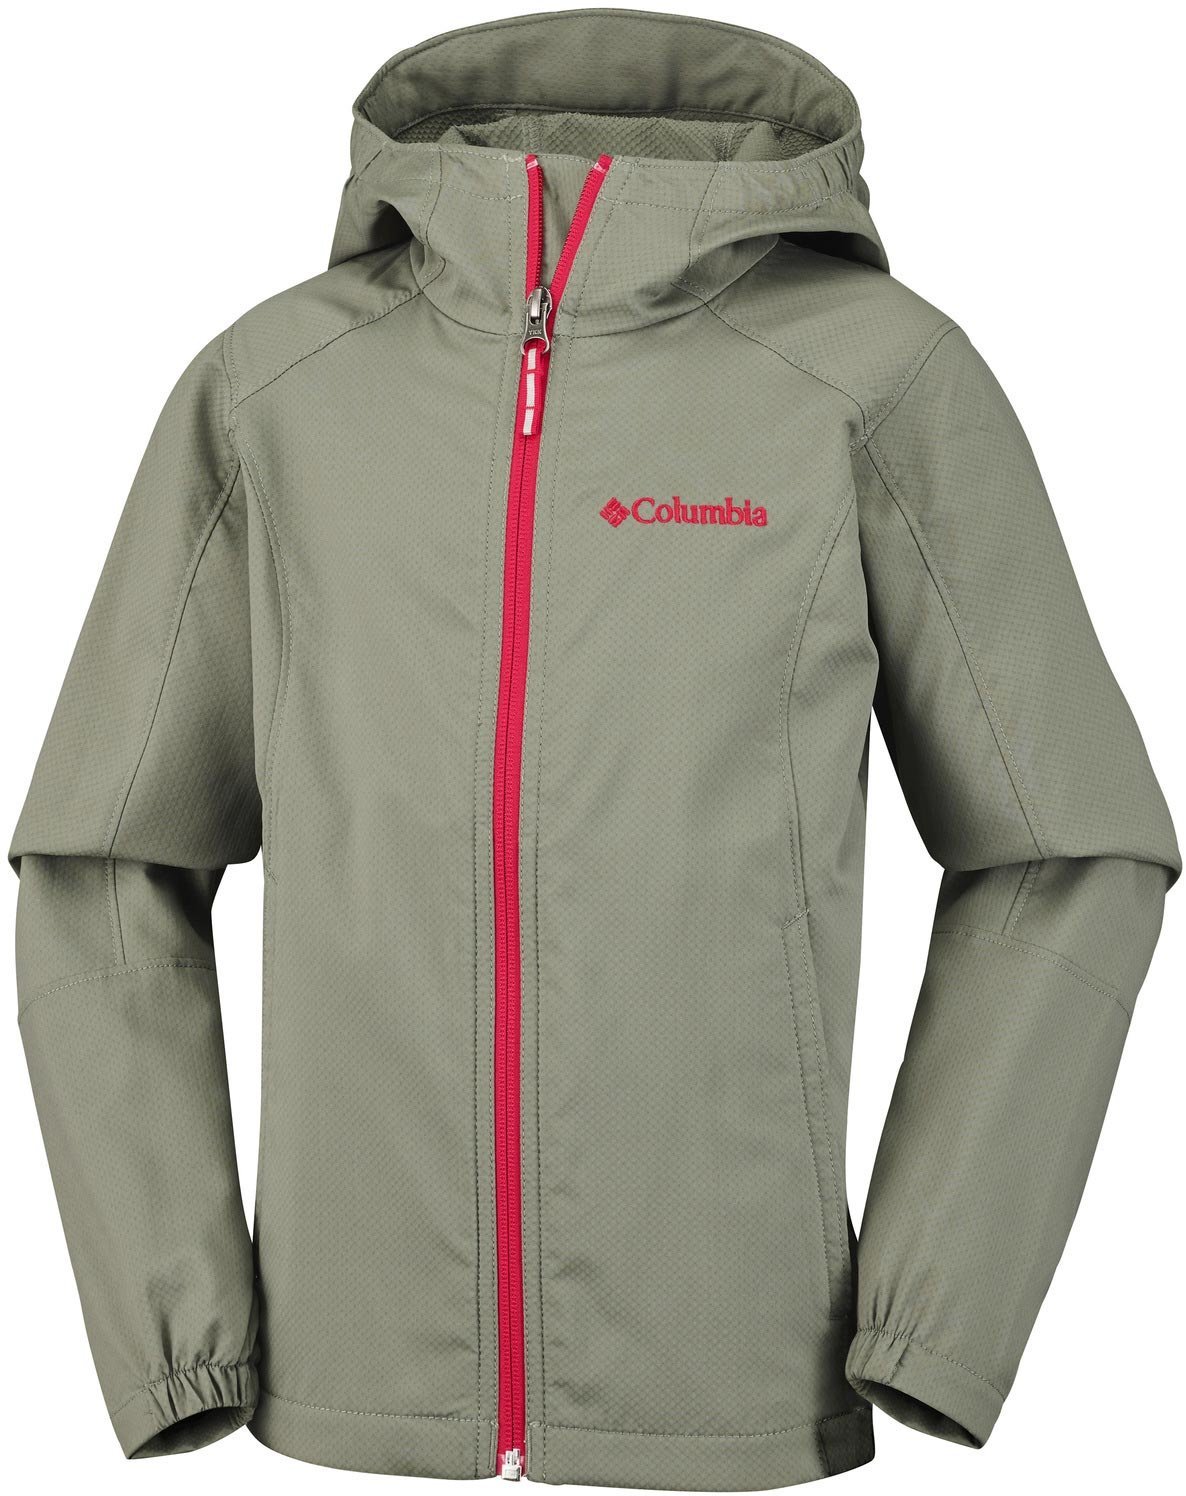 Columbia SplashFlash II Hooded Softshell Jacket S